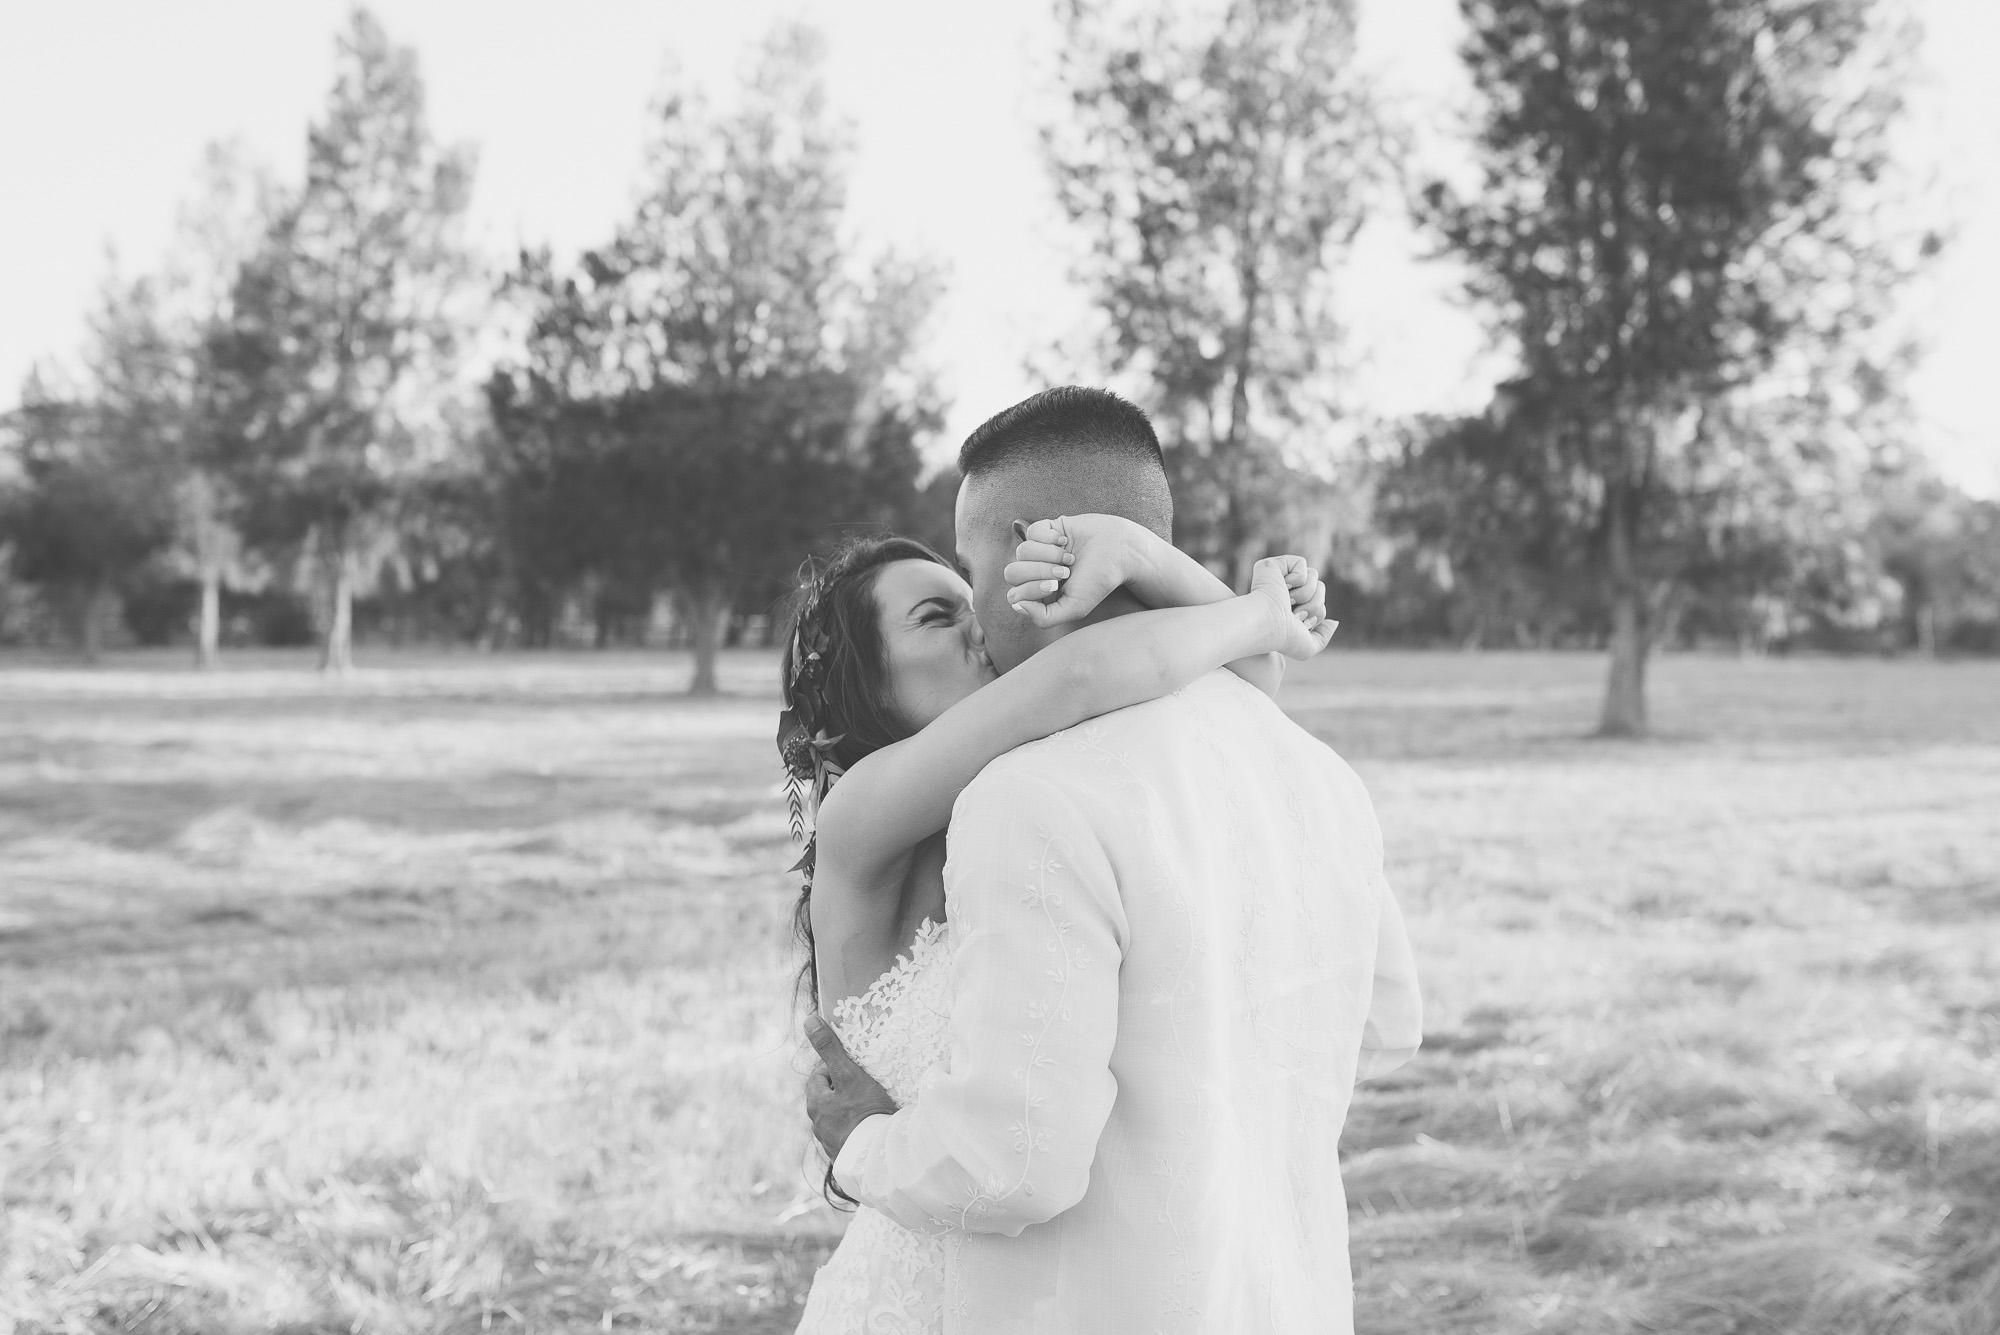 wedding-photographer-outdoor-casual-styled-los-angeles-australia-california-international-earthbound -63.jpg